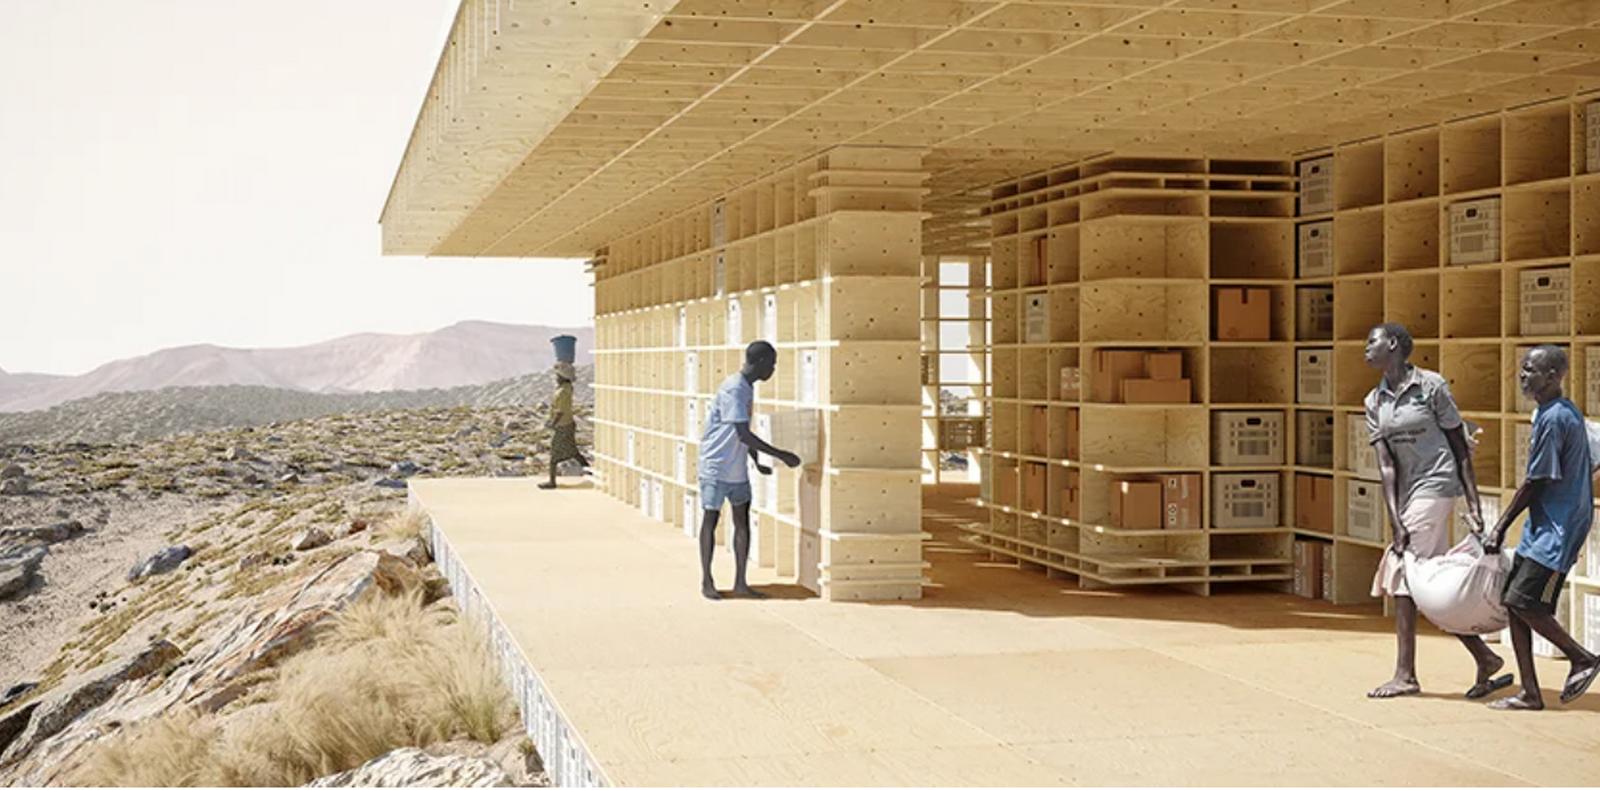 Adaptable Shelter for Sub Saharan Community - Sheet2